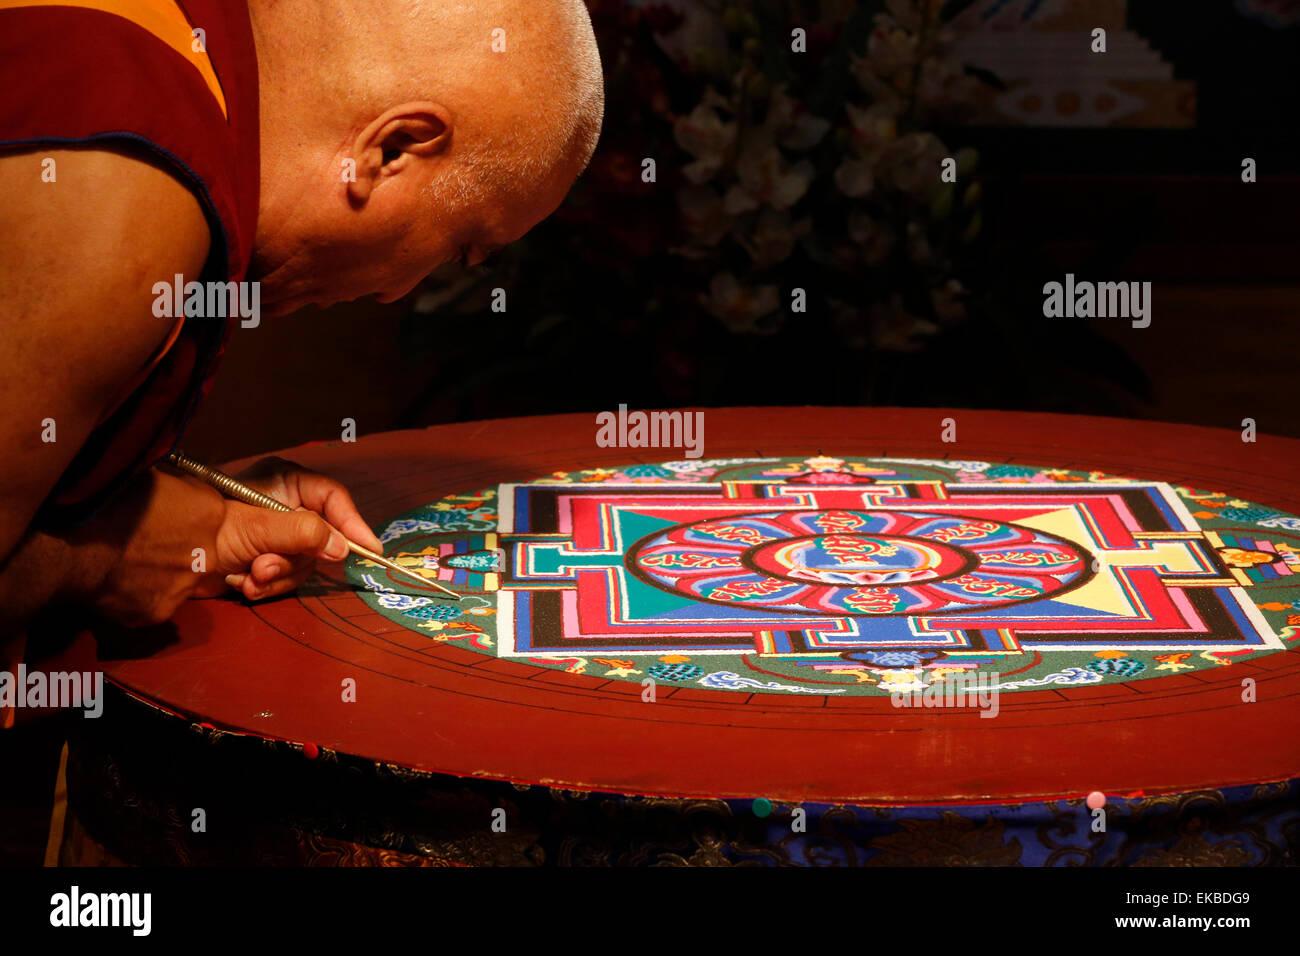 Buddhist sand Mandala, a spiritual and ritual symbol representing the Universe, Paris, France, Europe - Stock Image